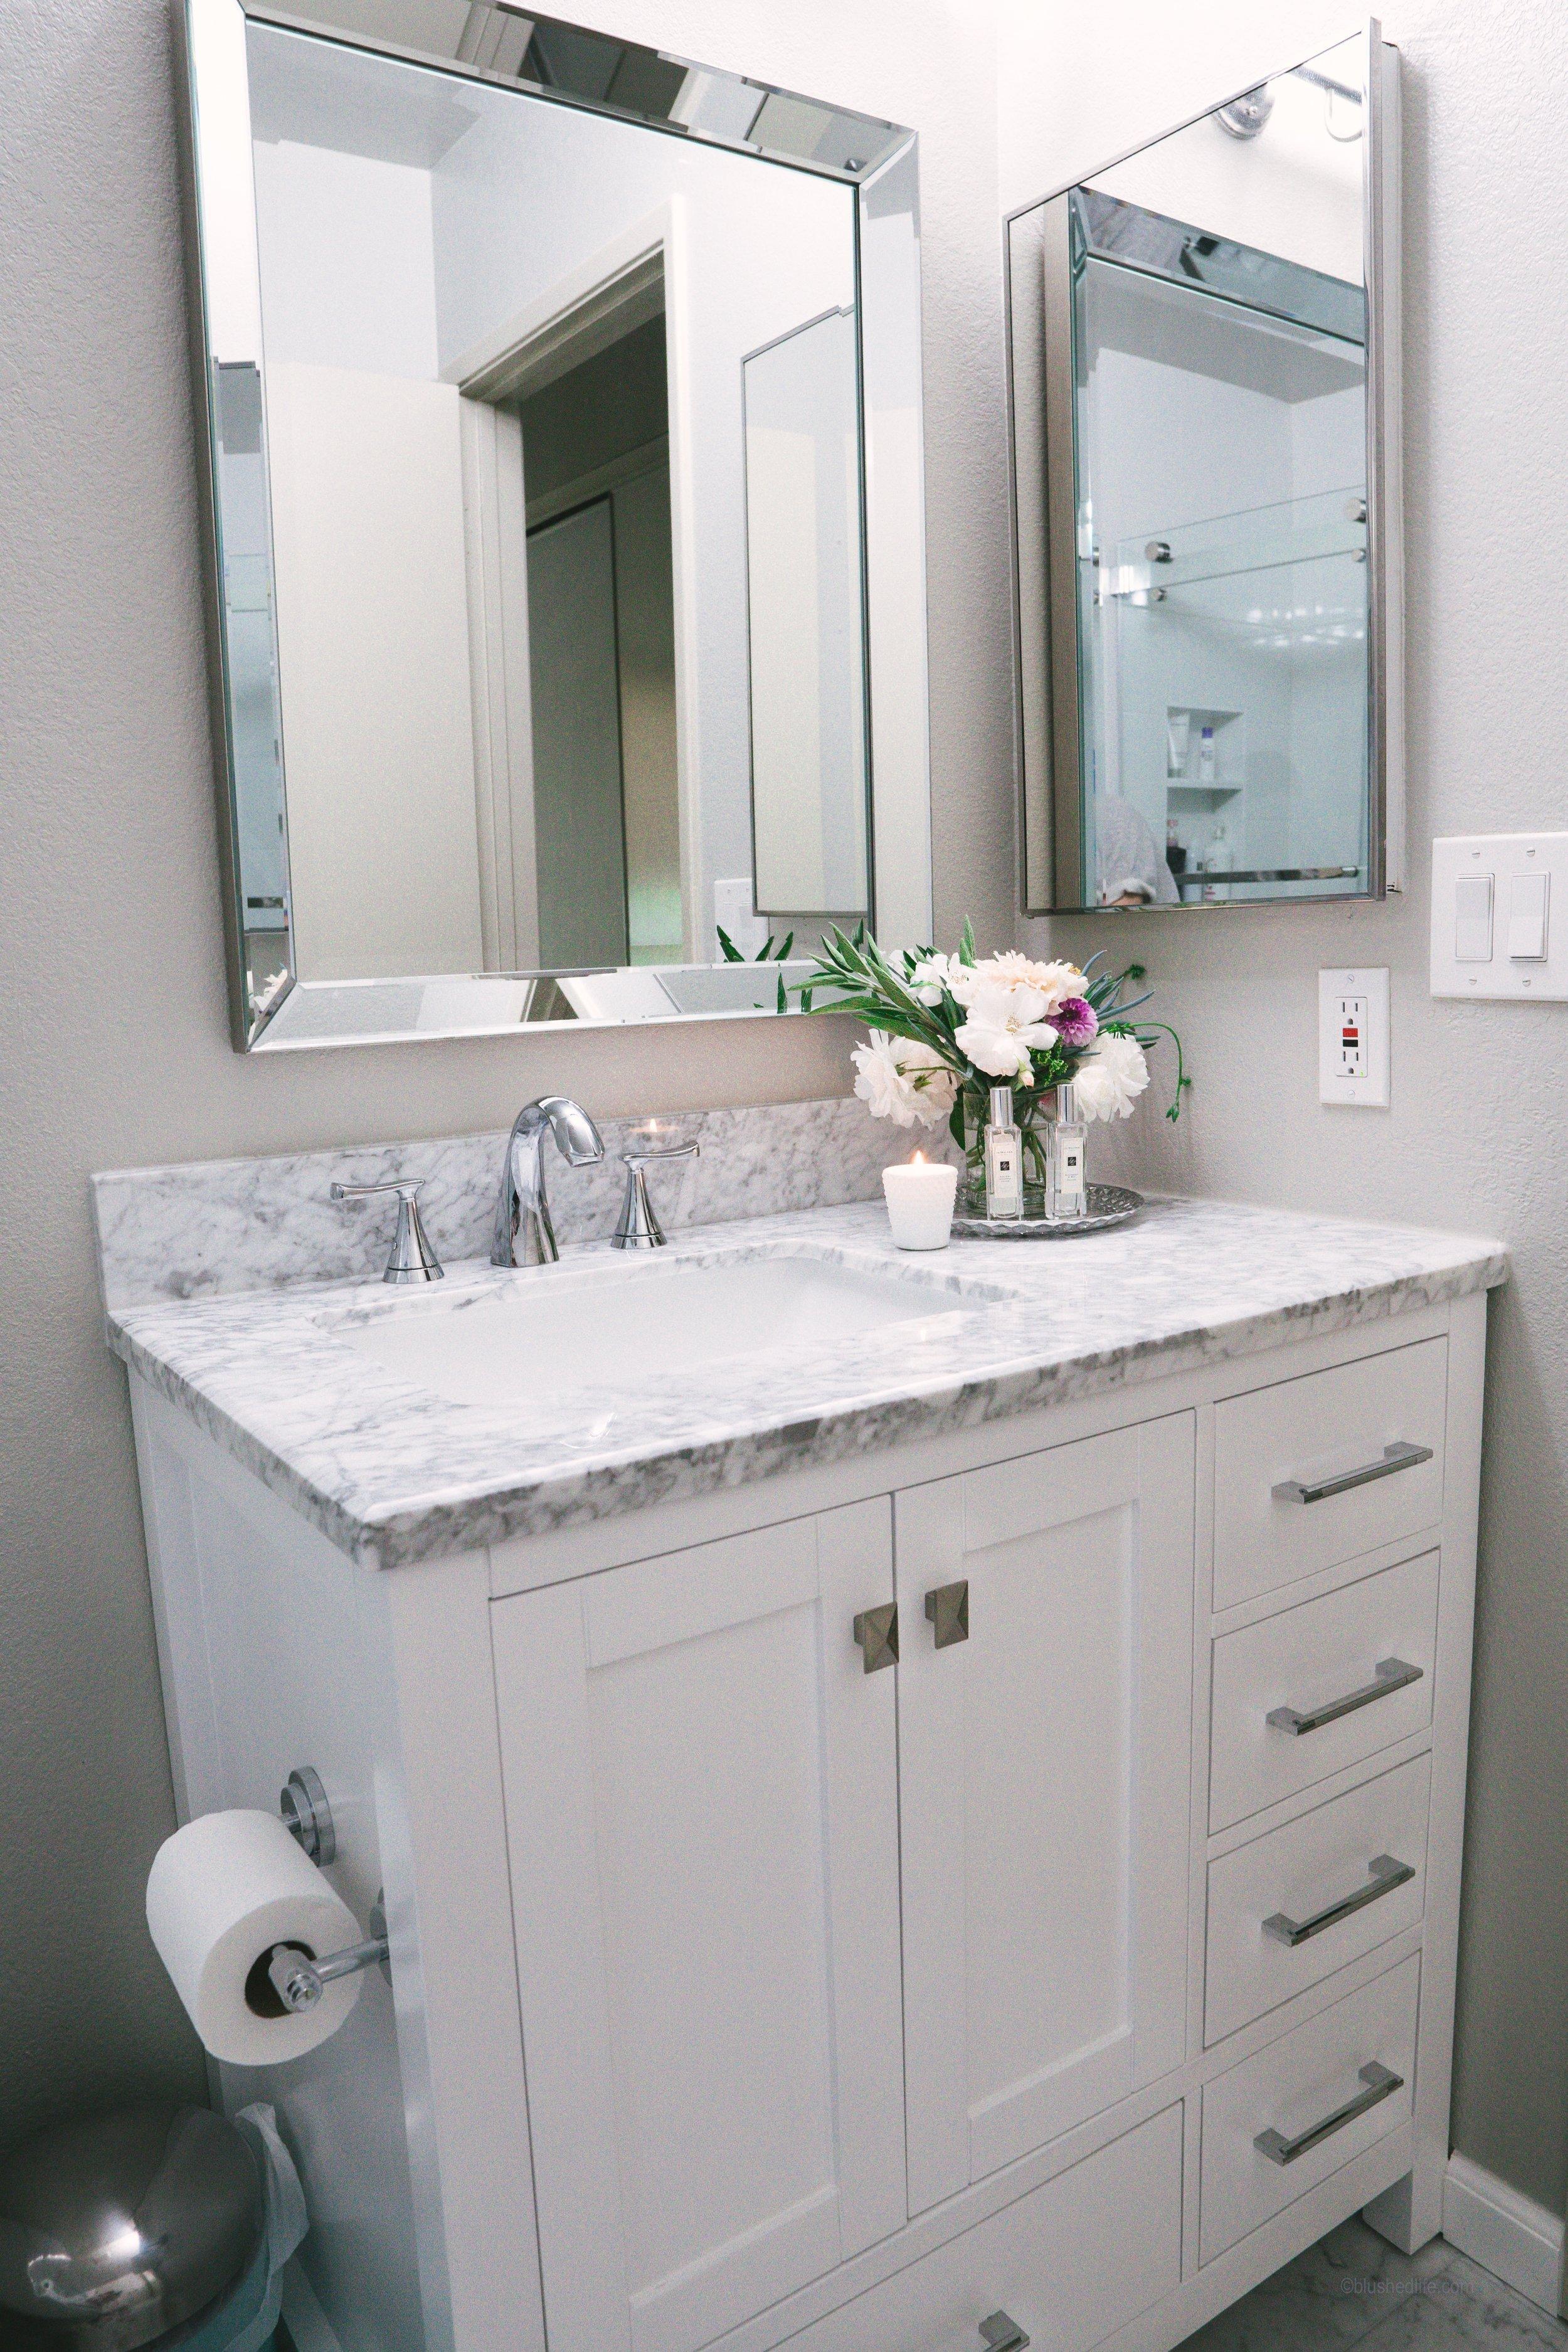 Small Bathroom Makeover After_DSC00224.jpg